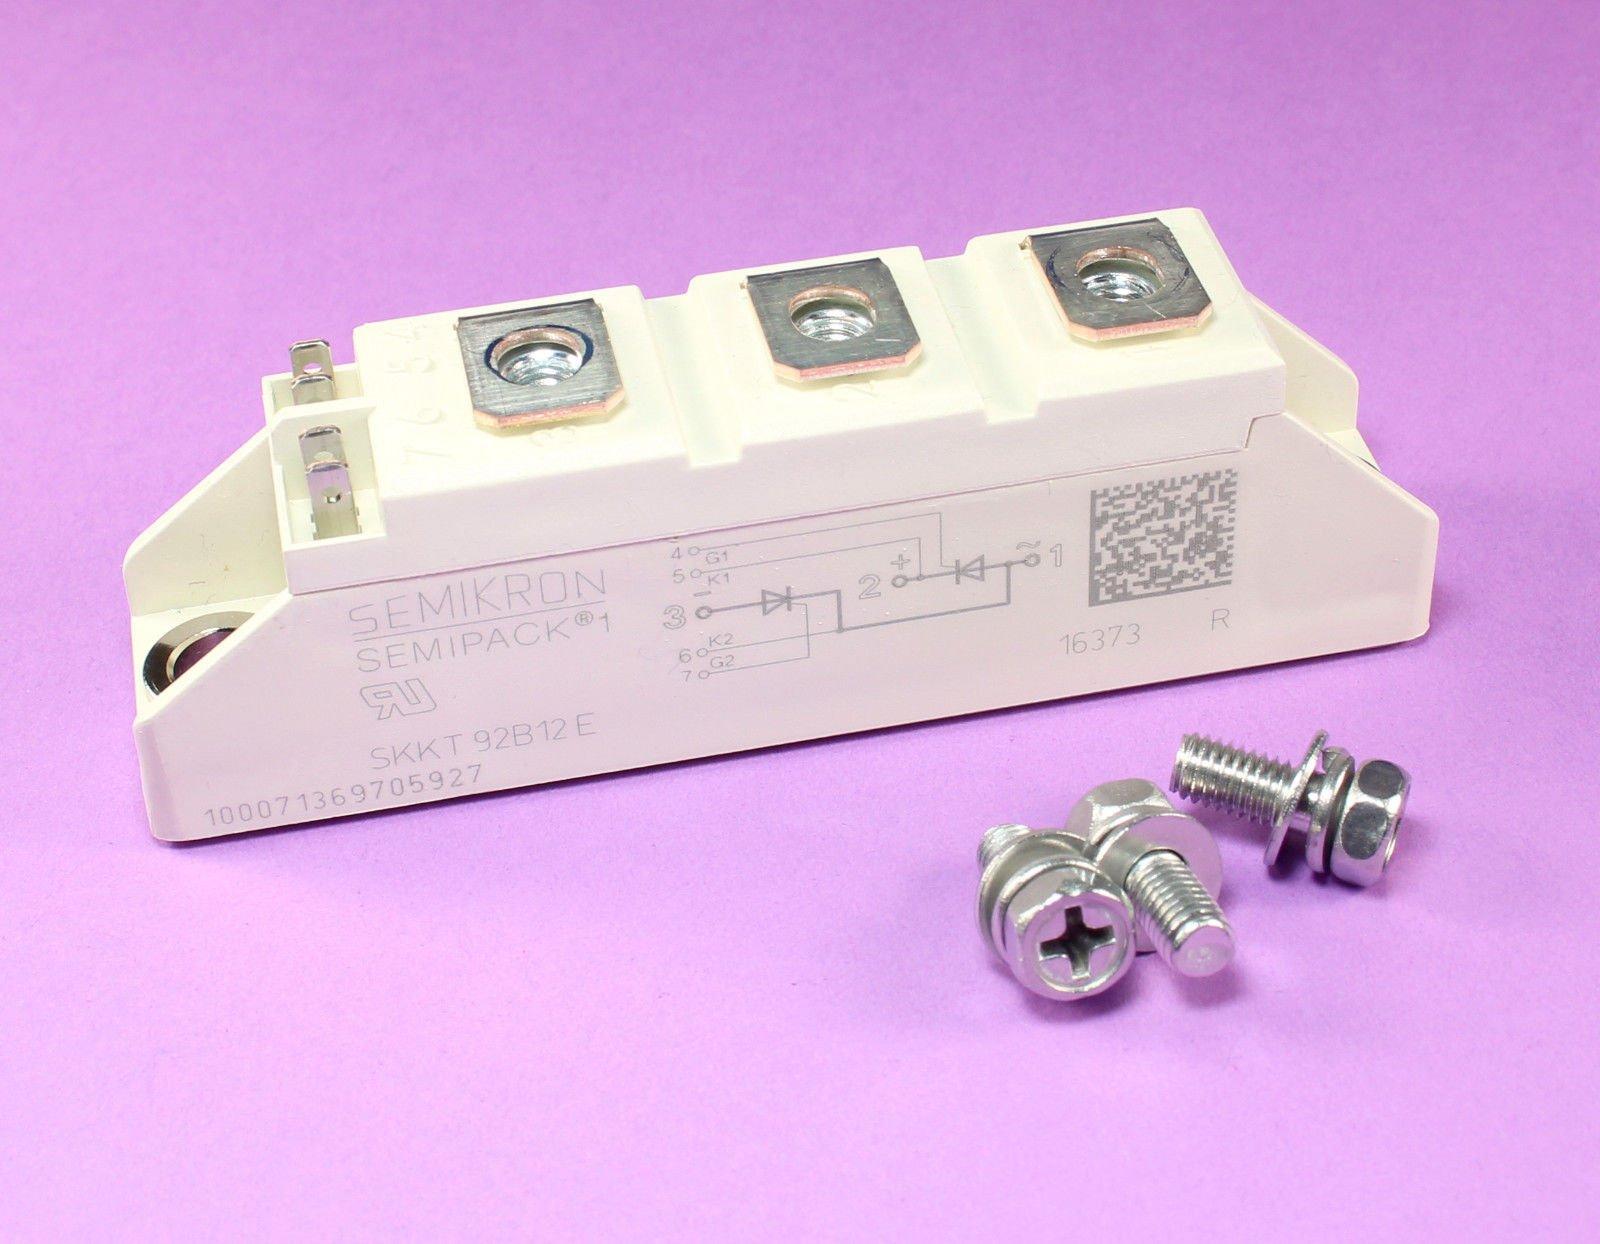 SEMIKRON SKKT 92B12 E, Dual Thyristor Module SCR, 95A 1200V, 7-Pin Semipack1 by Semikron (Image #1)